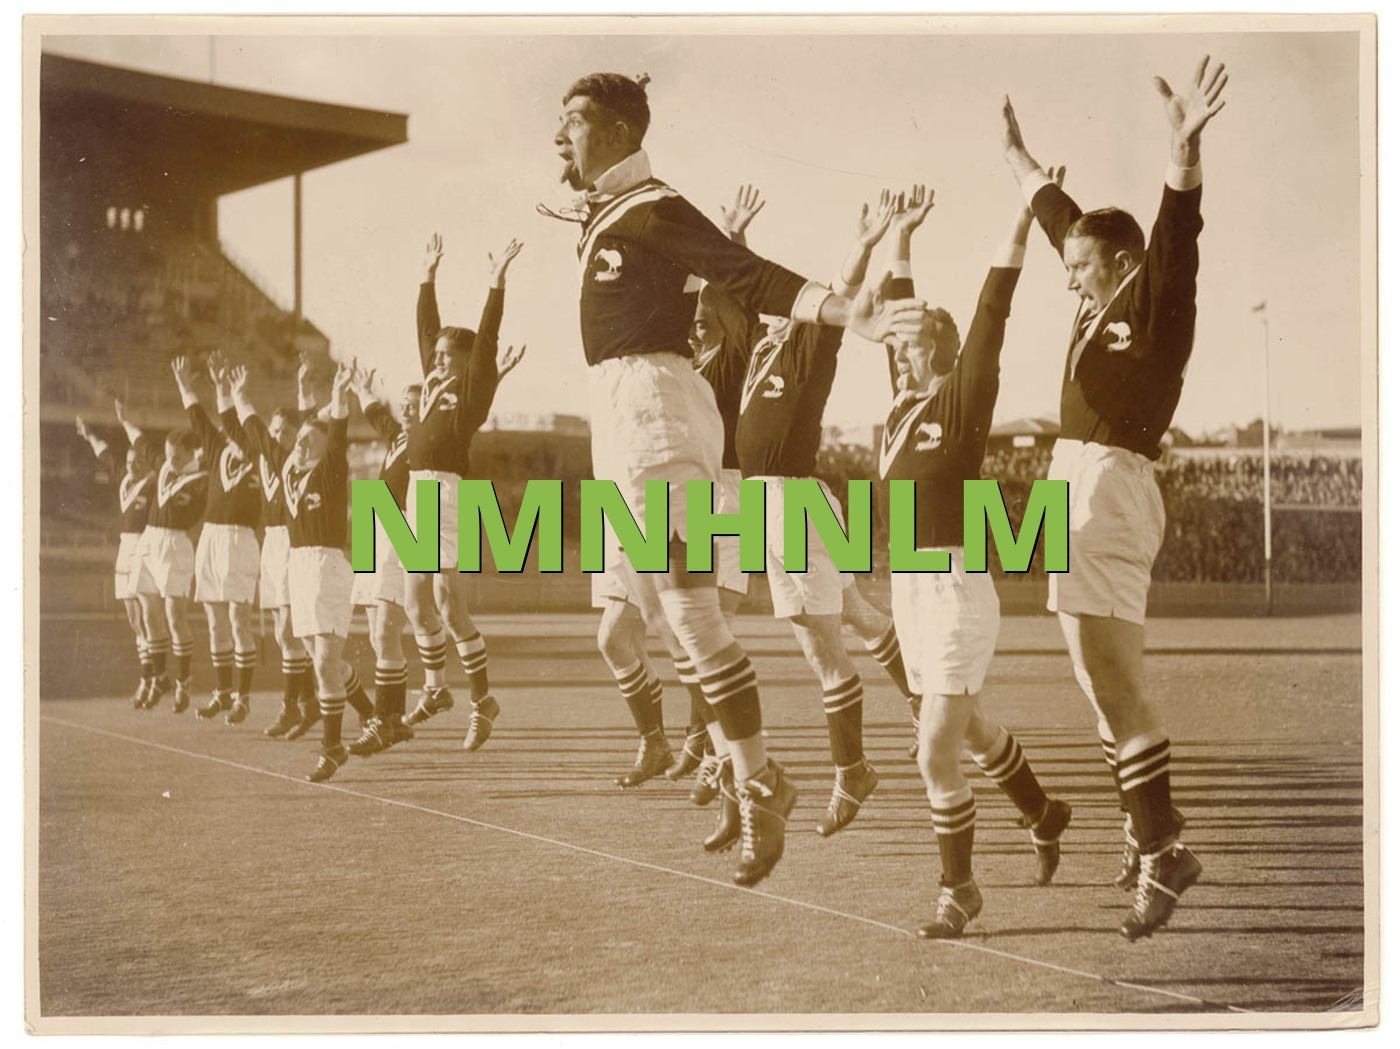 NMNHNLM